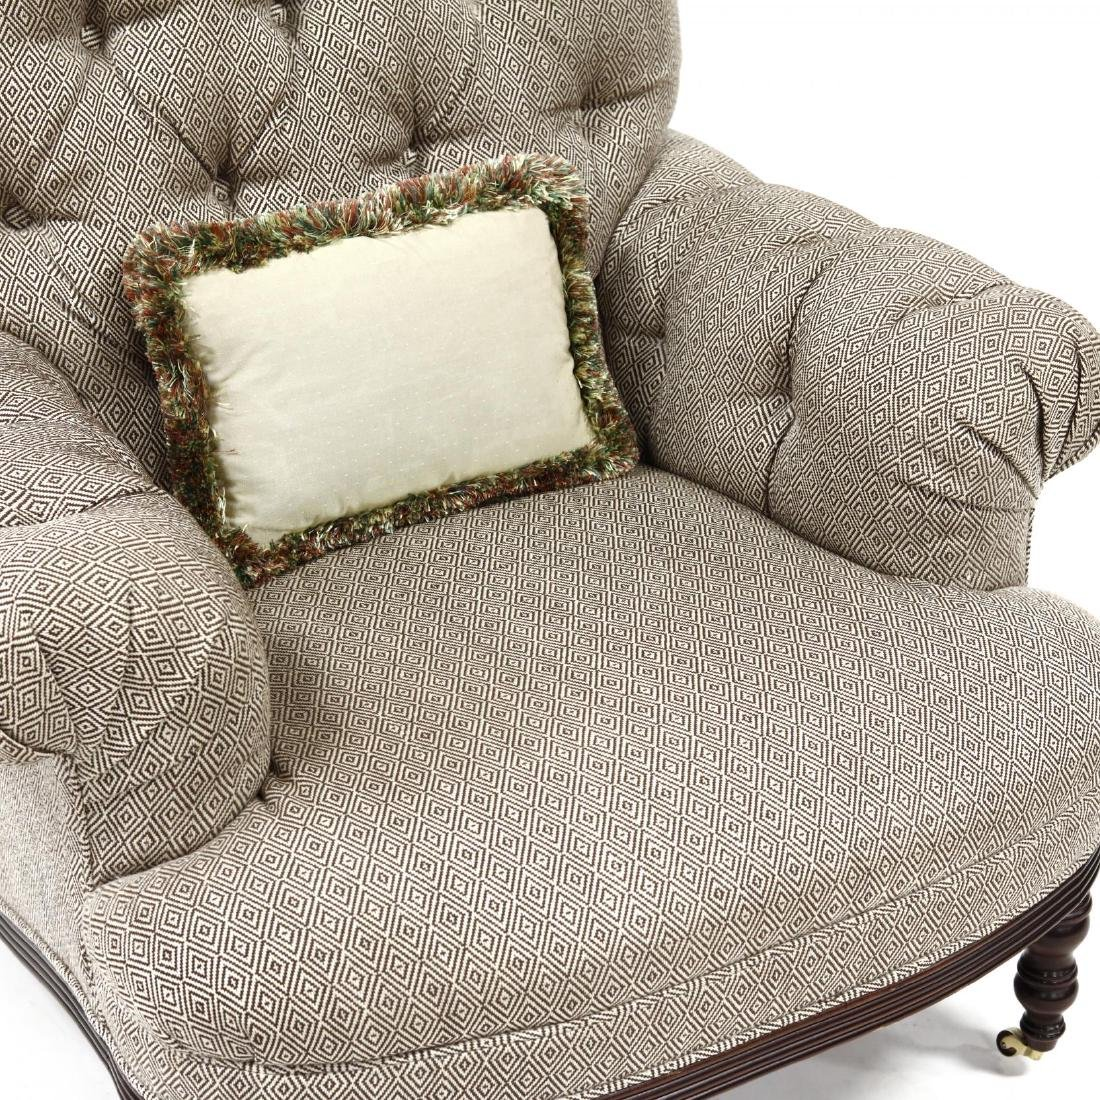 Baker, Overupholstered Library Chair - 2